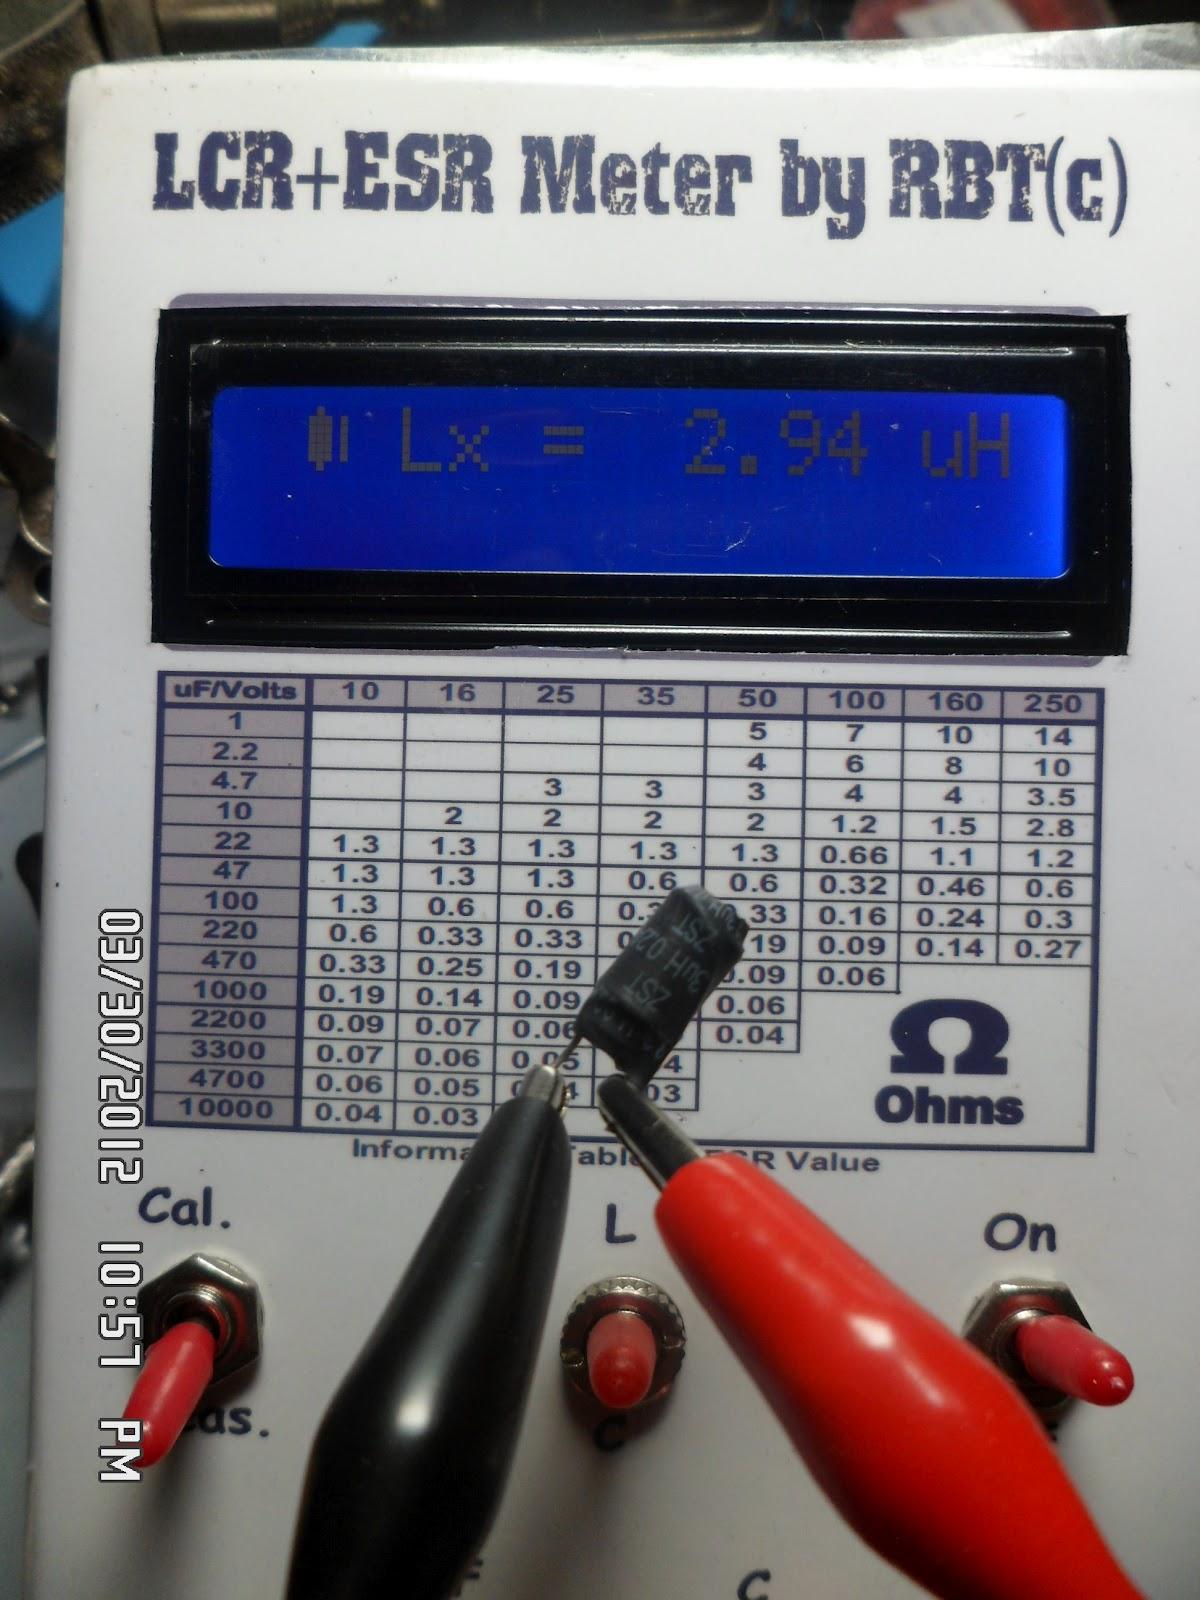 Diy Lcr Meter : Rbt s tech depot diy lcr esr meter